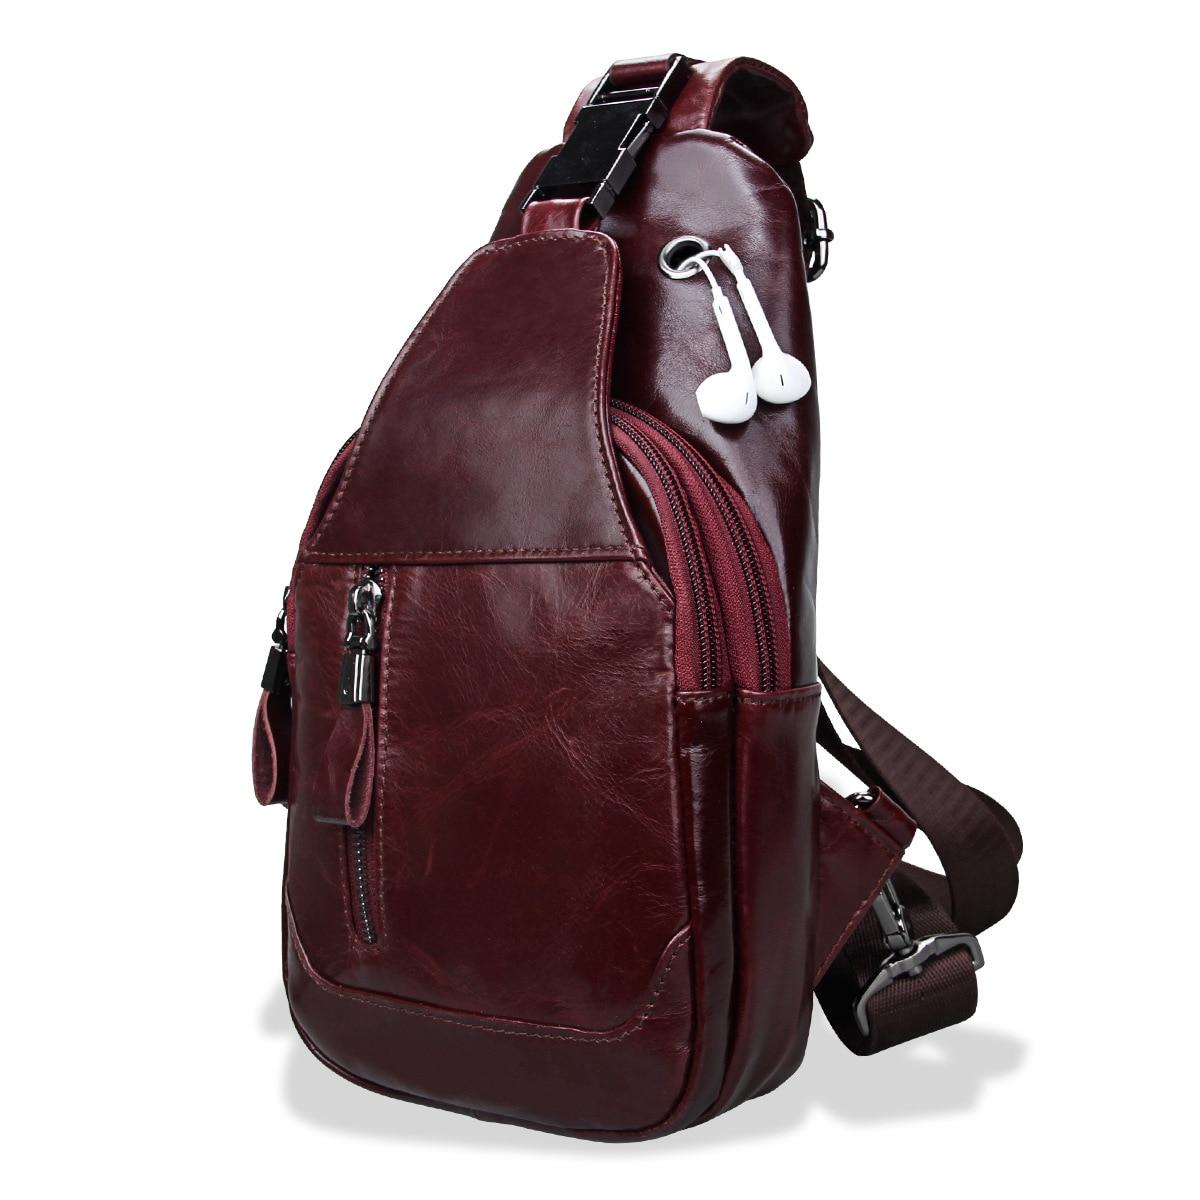 Genuine Leather Men Waist Packs Travel Chest Bag Unisex Belt Bag Men Money Belt shoulder Bag Bum crossbody bags for Women purse